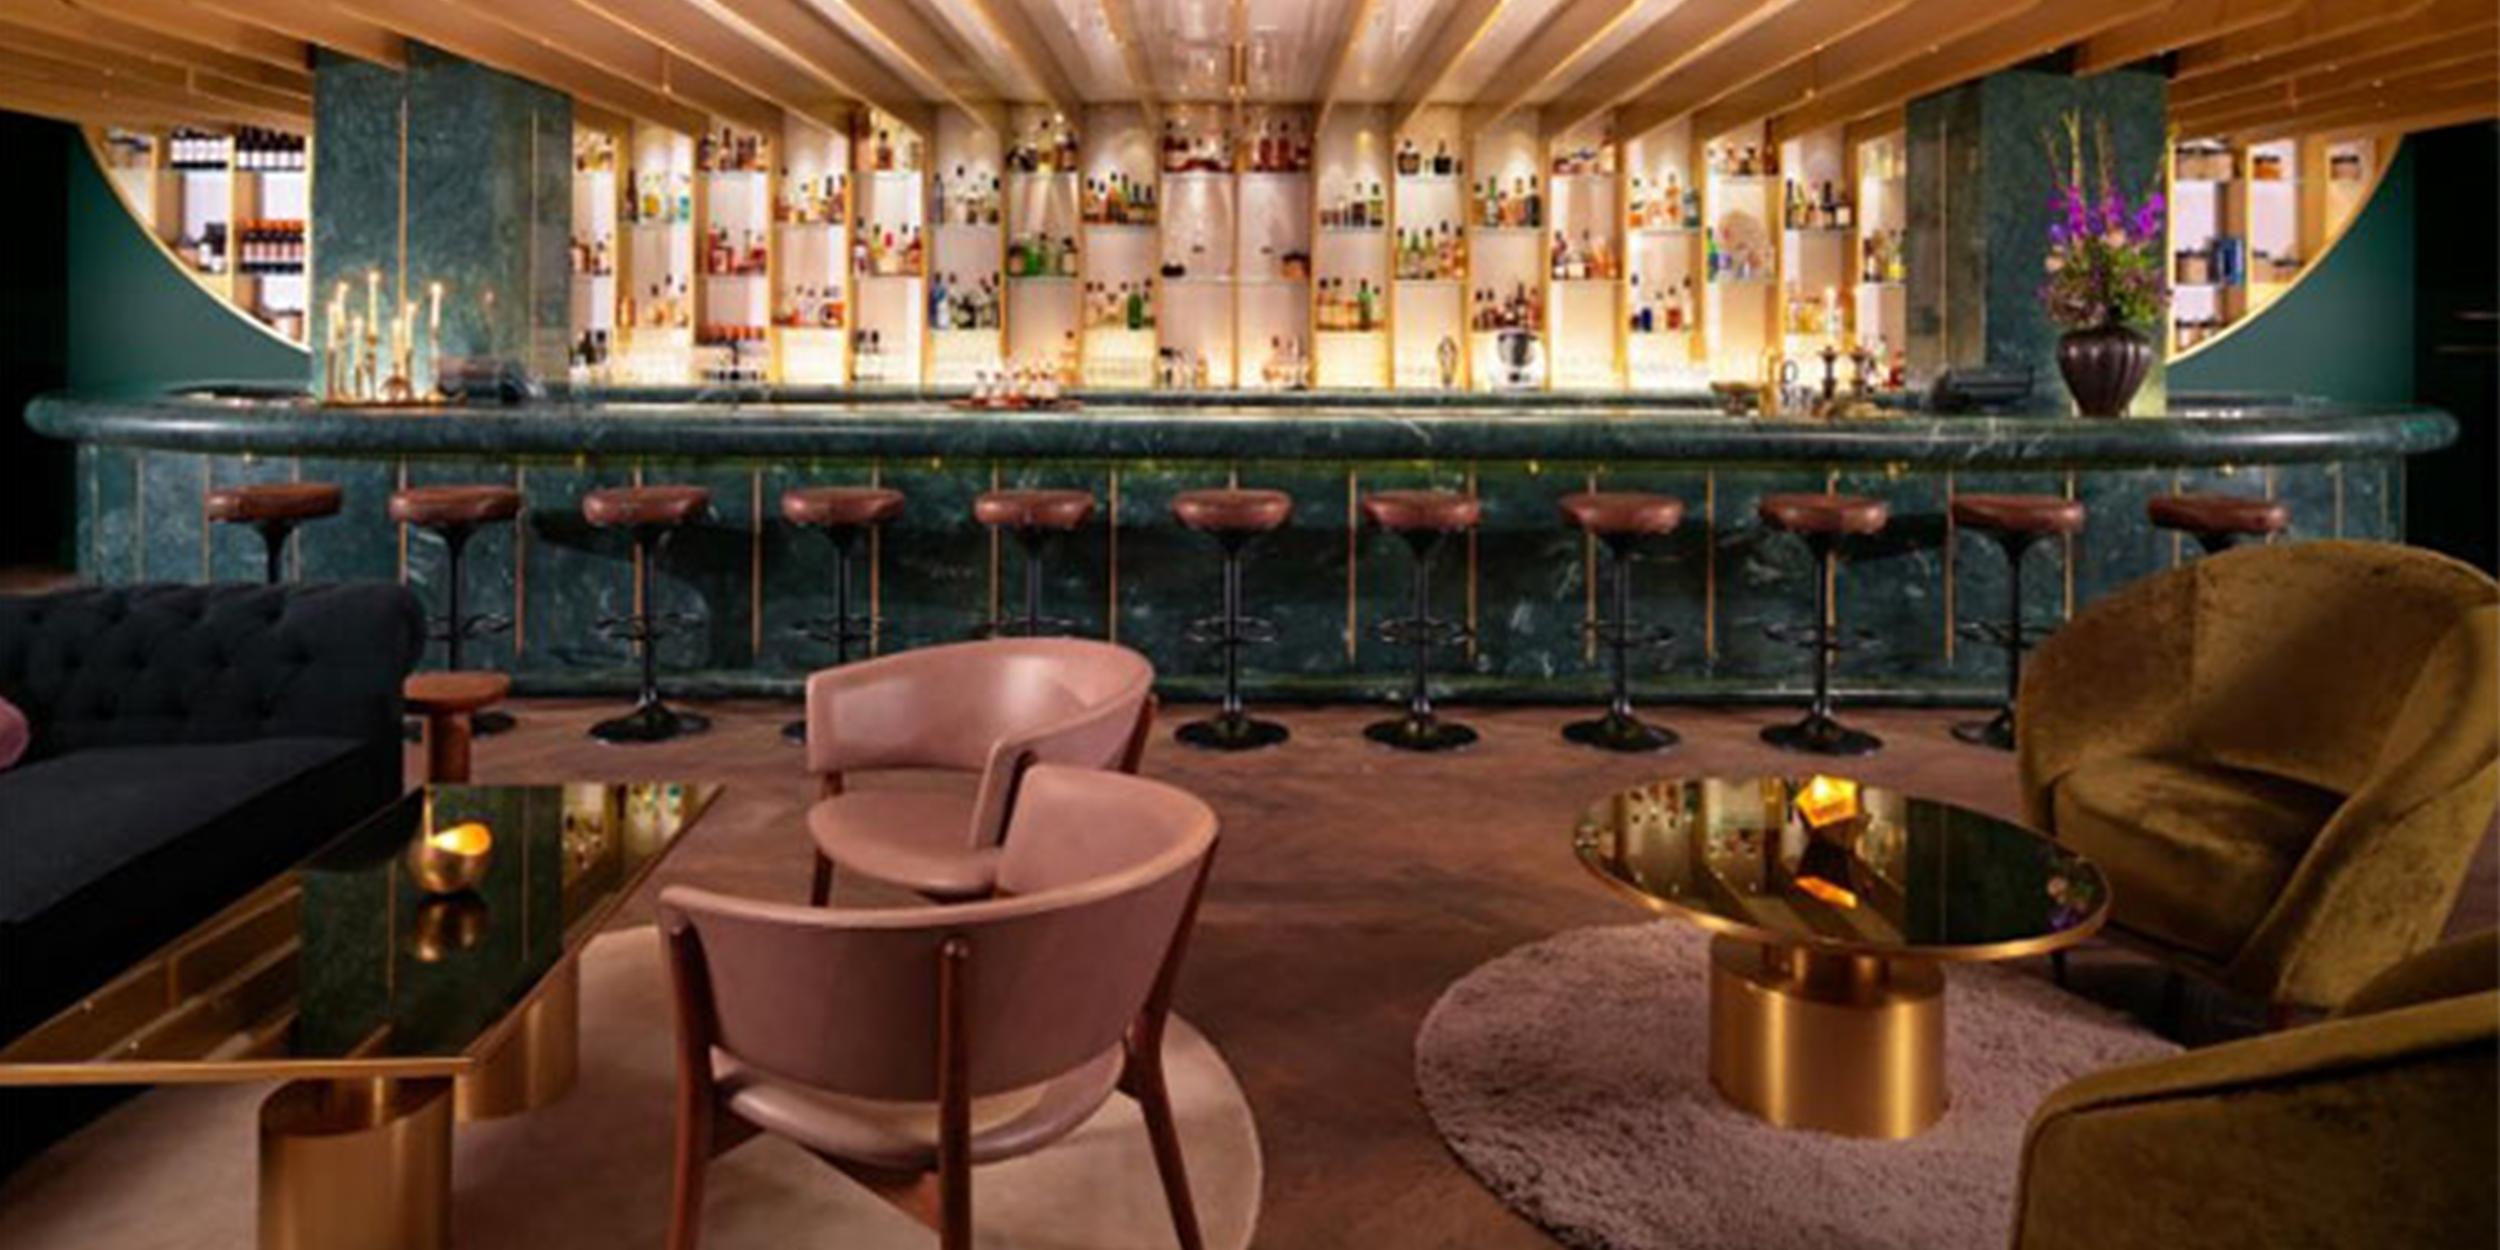 London Cocktail Bars